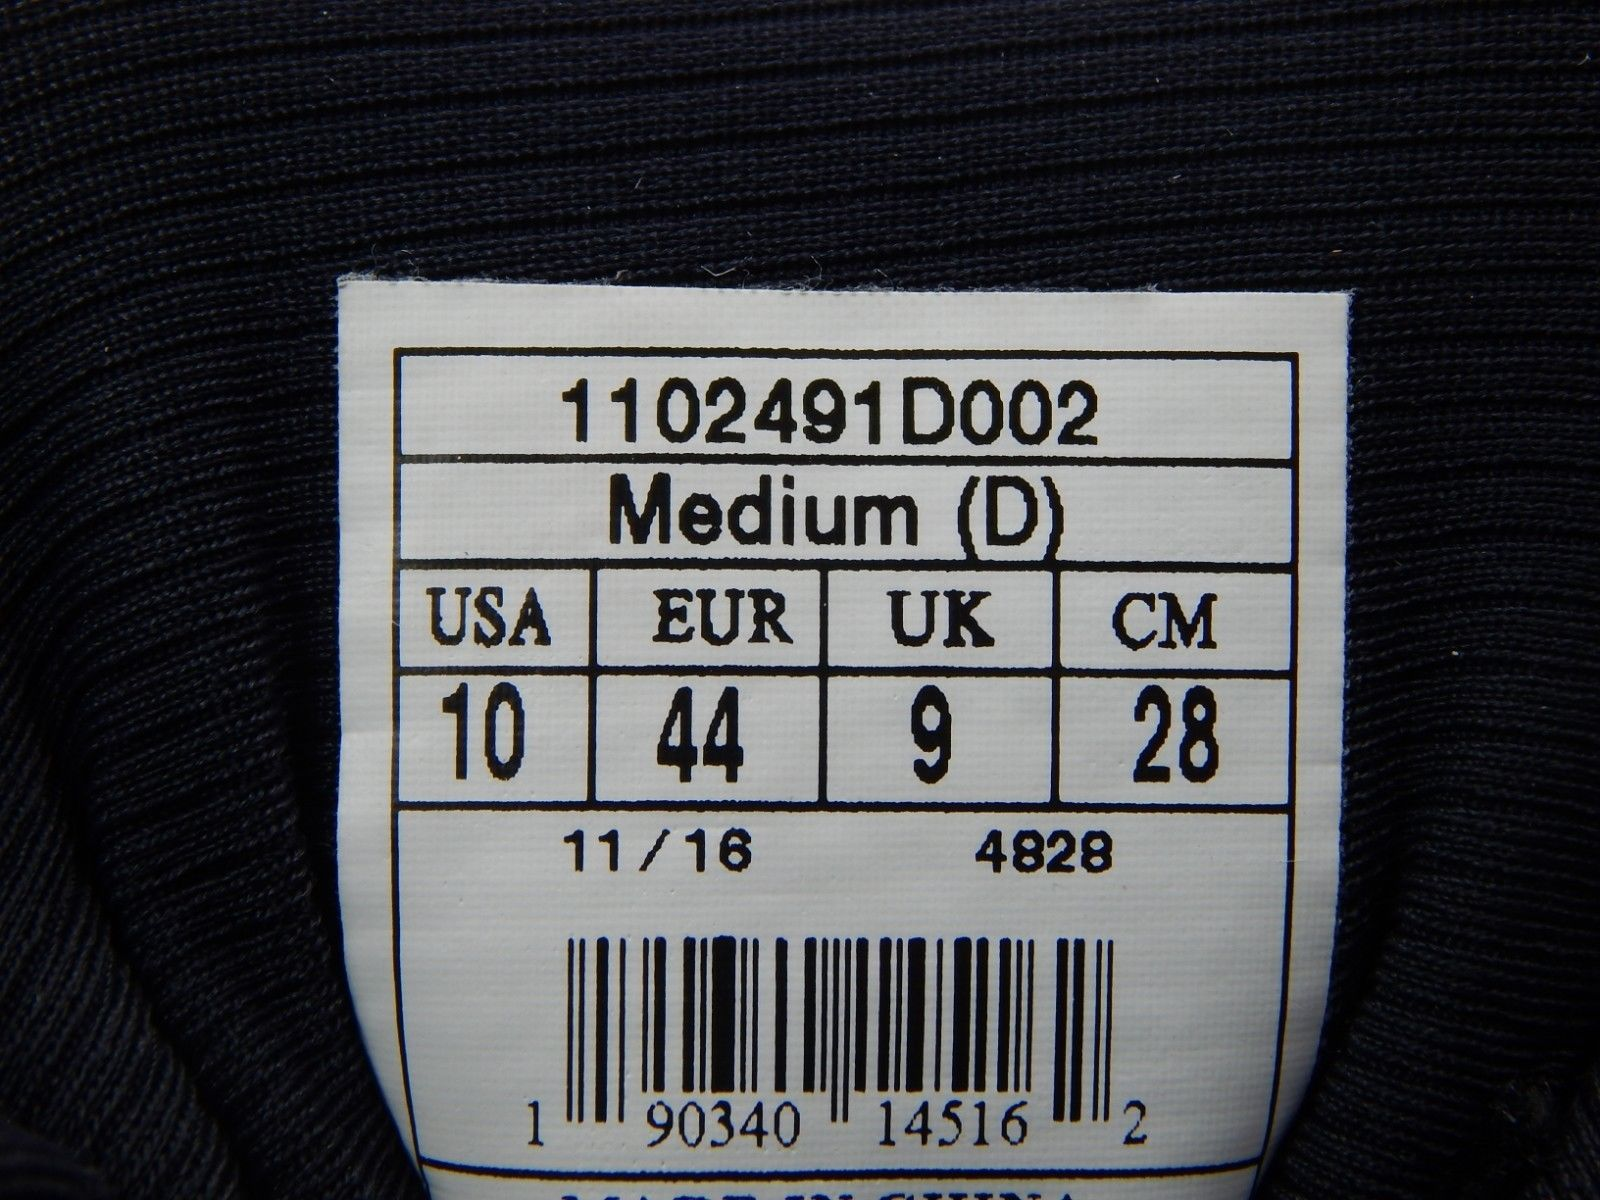 Brooks Transcend 4 Size US 10 M (D) EU 44 Men's Running Shoes Black 1102491D002 image 12